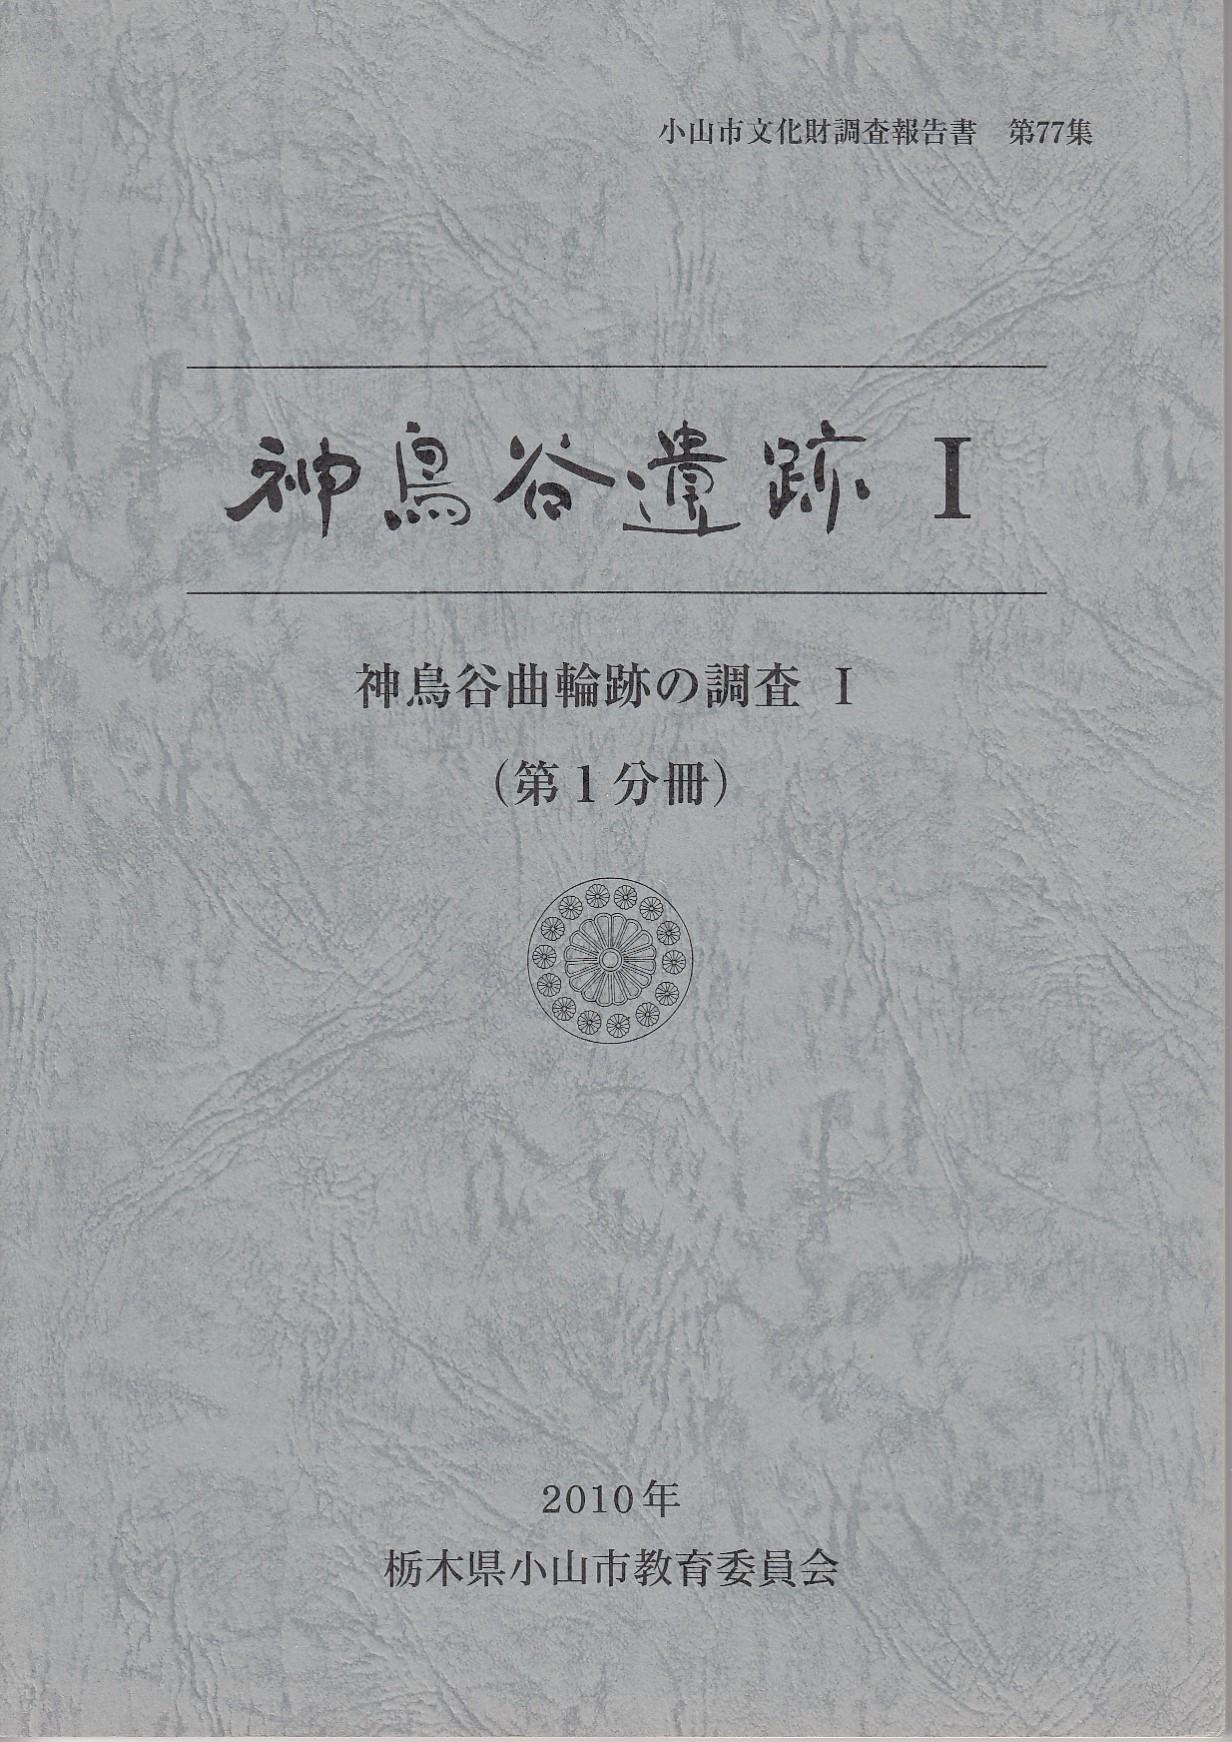 No-0166